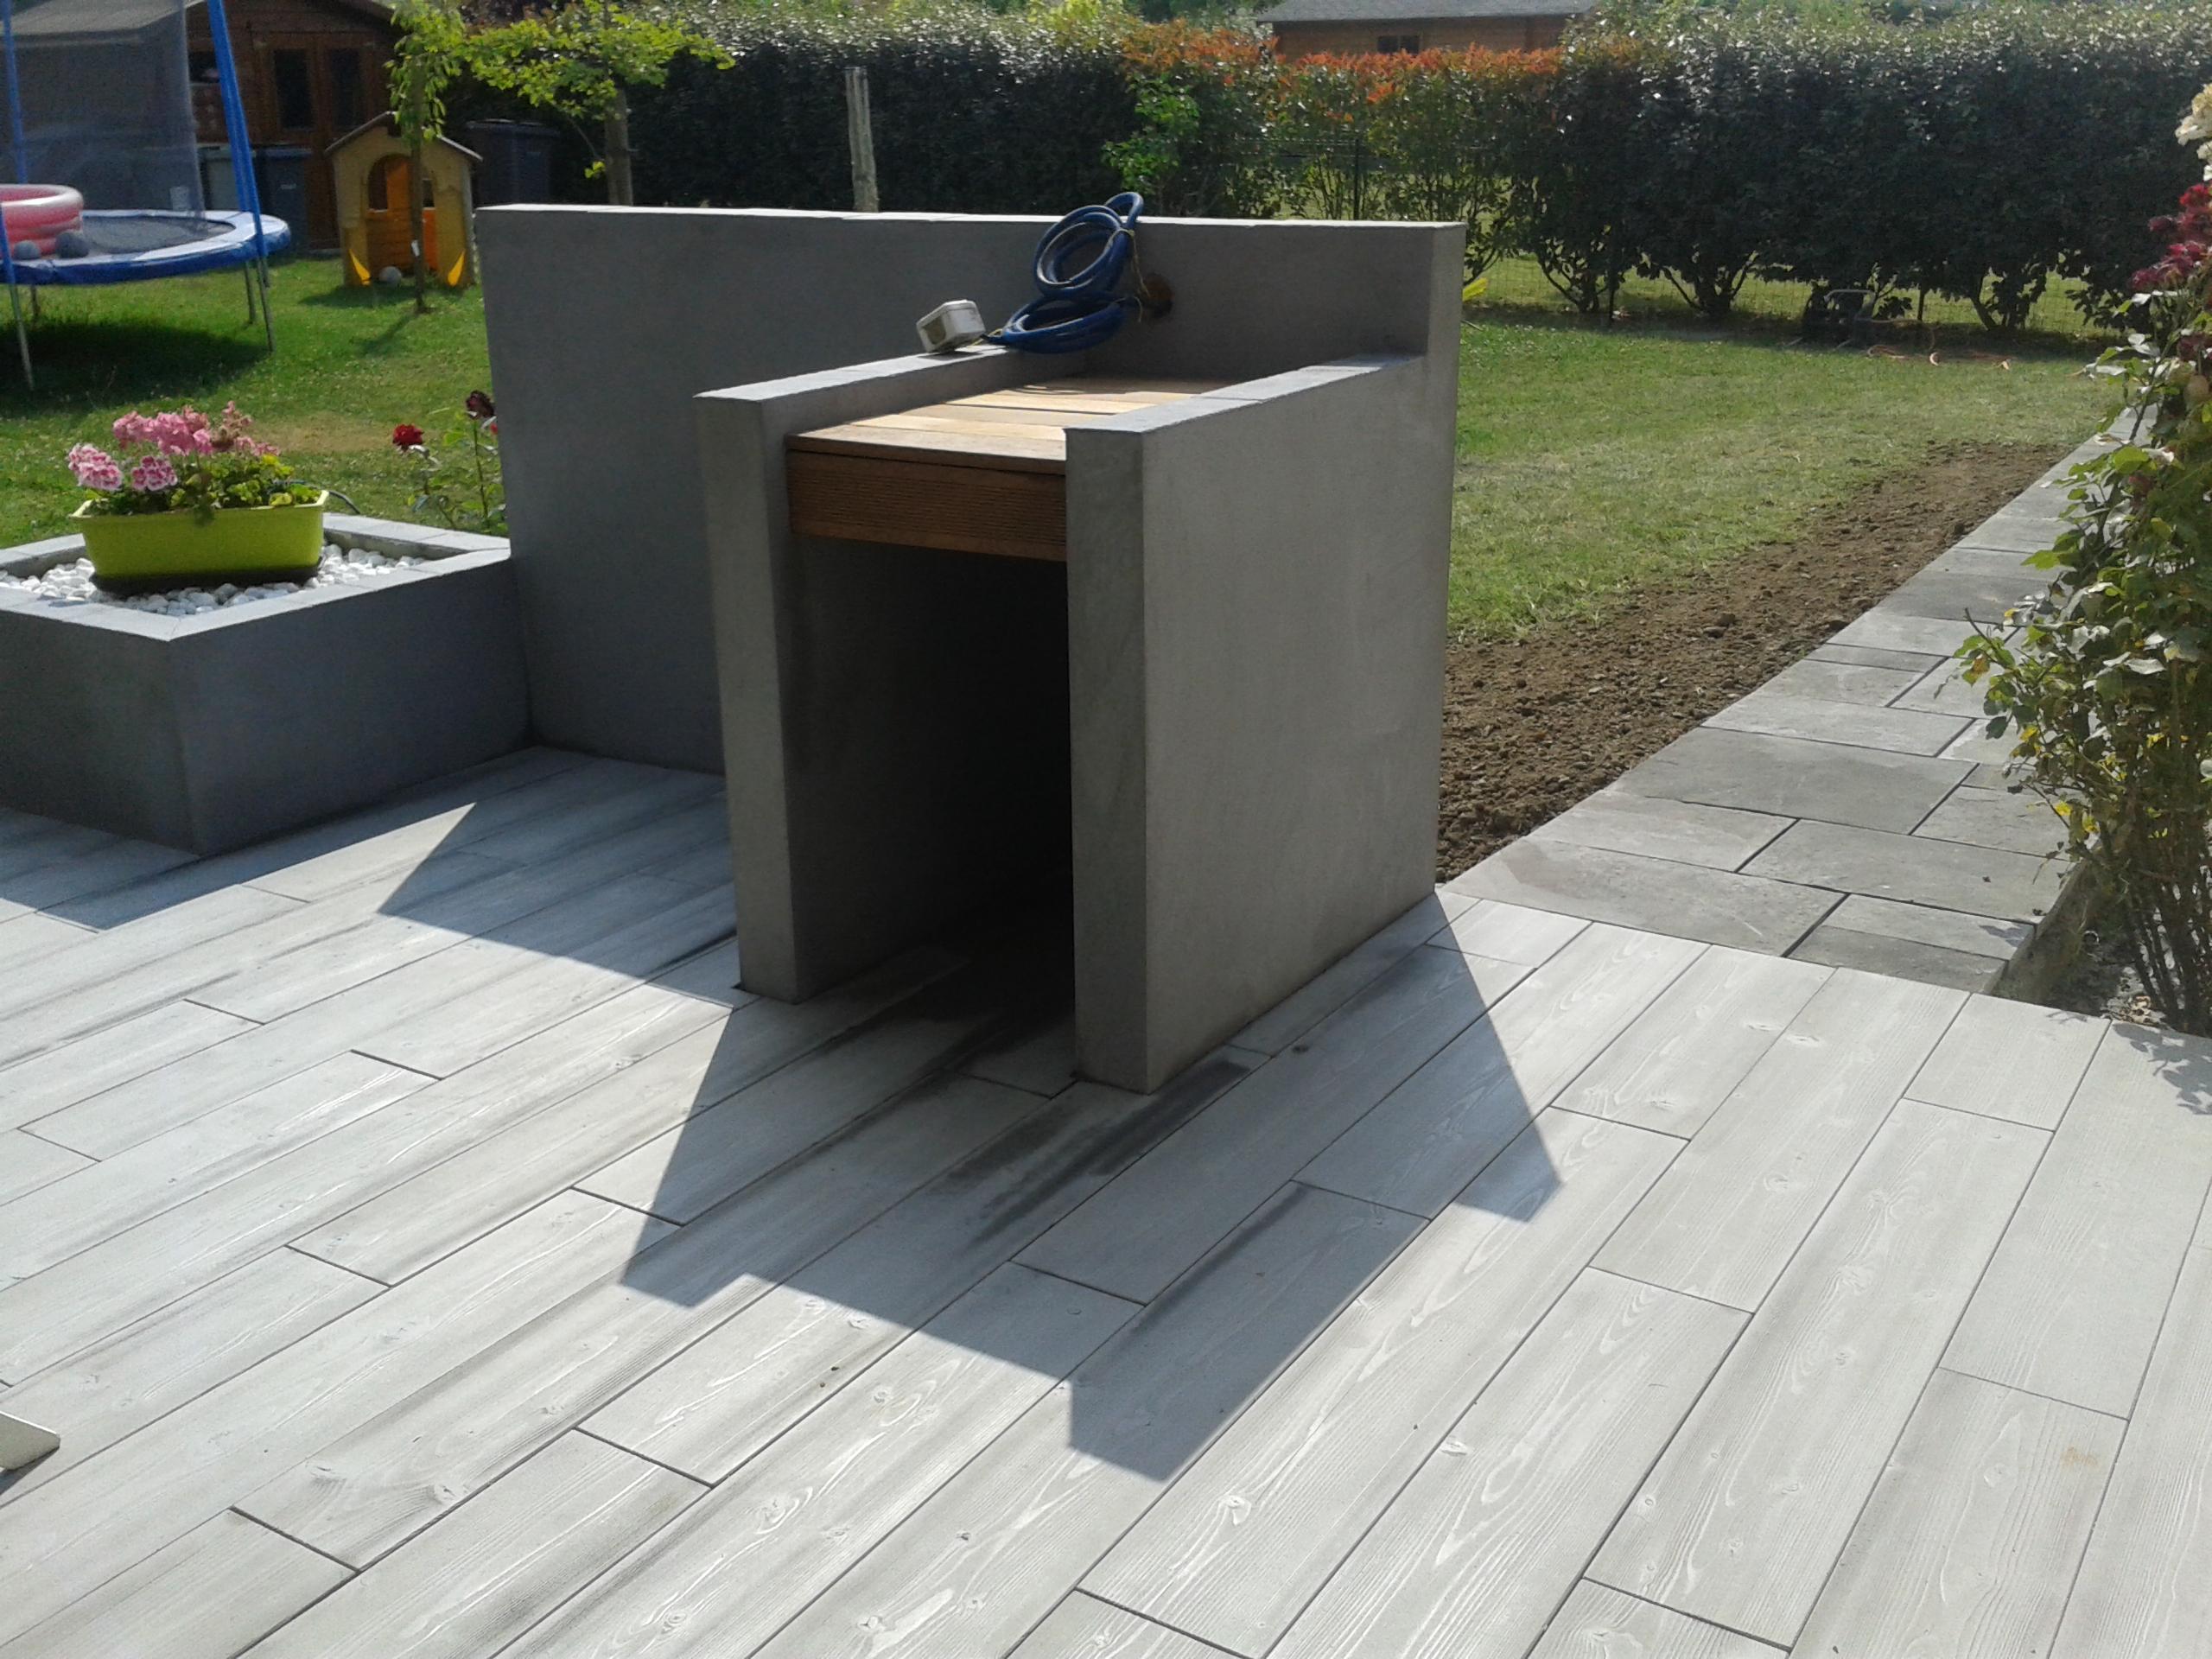 terrasse beton bois nos conseils. Black Bedroom Furniture Sets. Home Design Ideas